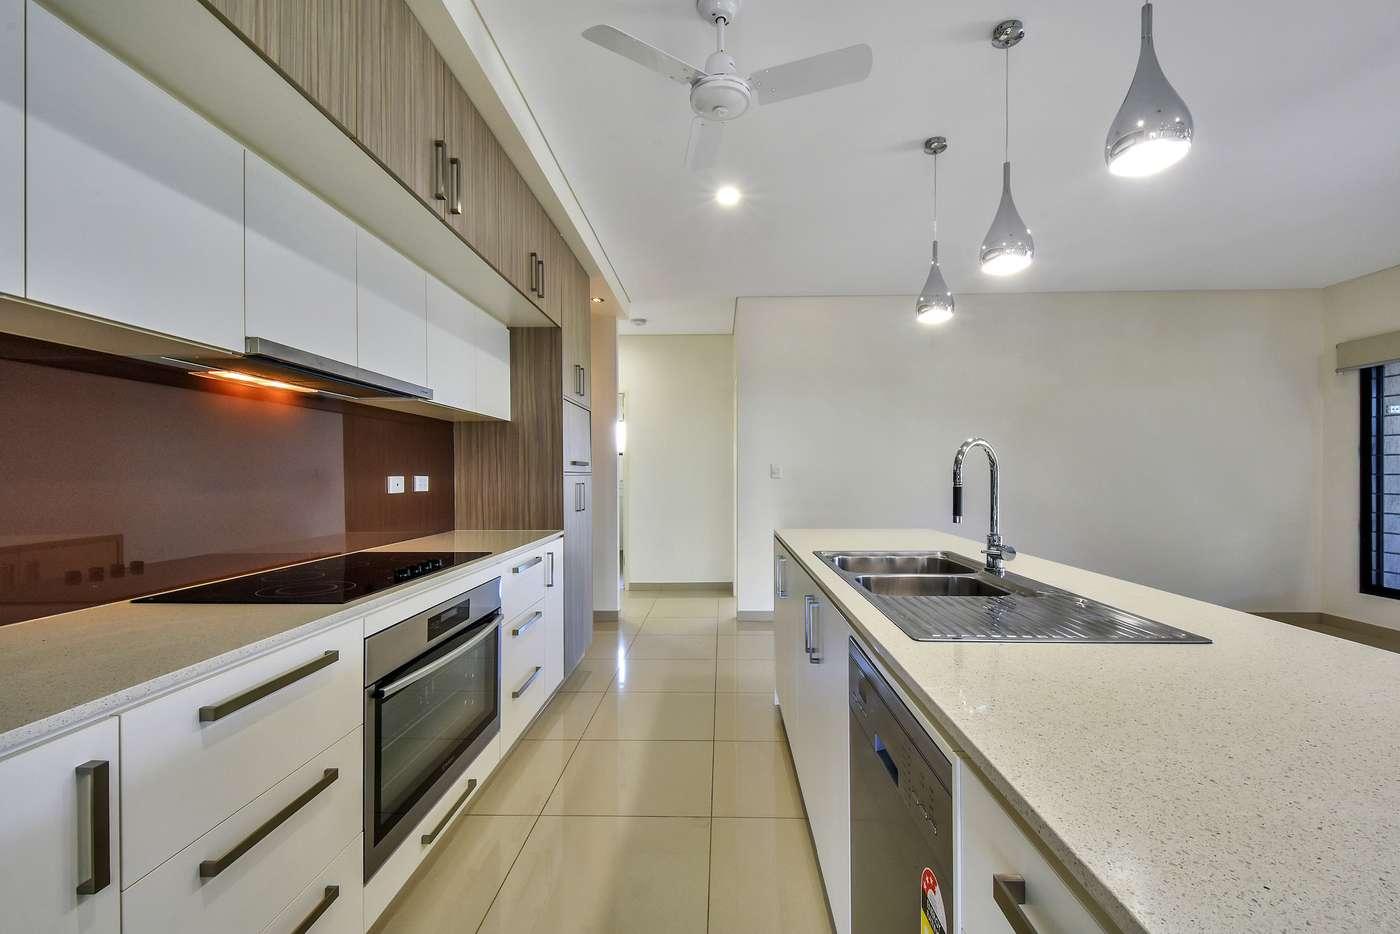 Main view of Homely house listing, 19 Bevan Street, Muirhead NT 810